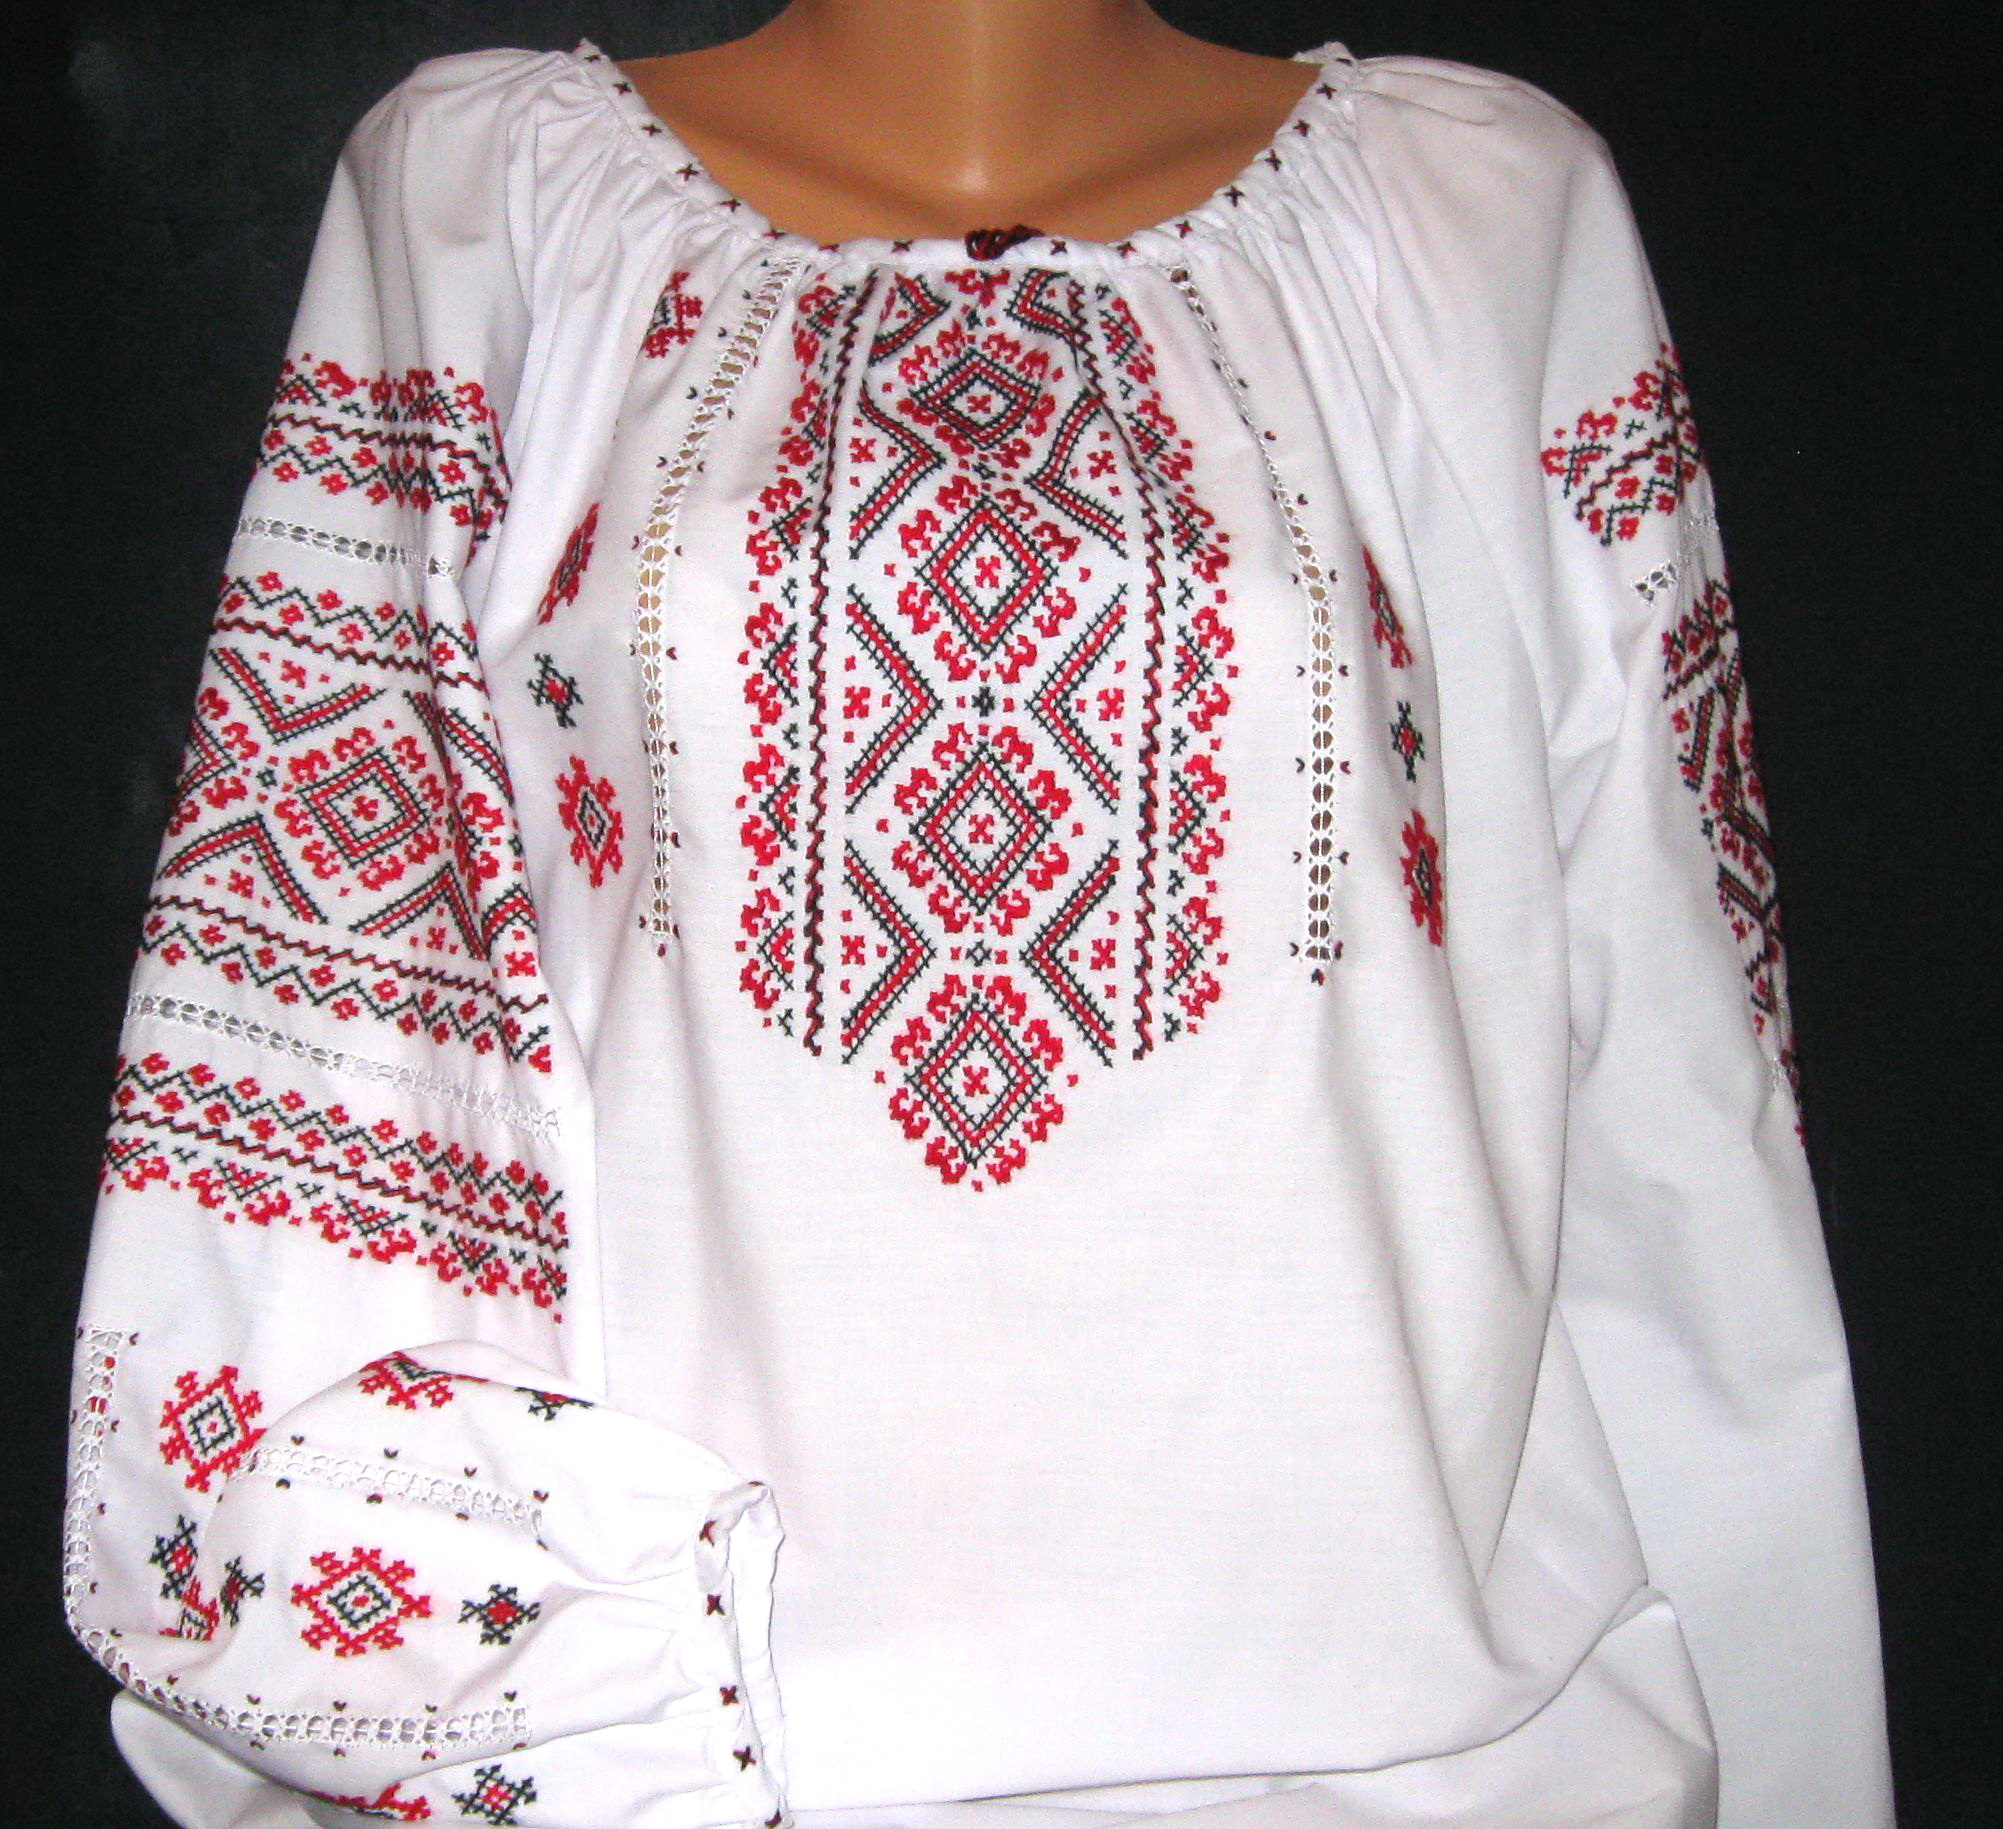 b568c5afd6e1ad Сорочка вишиванка жіноча - Photo Gallery - чигирин - Ukrbiznes, UB.UA